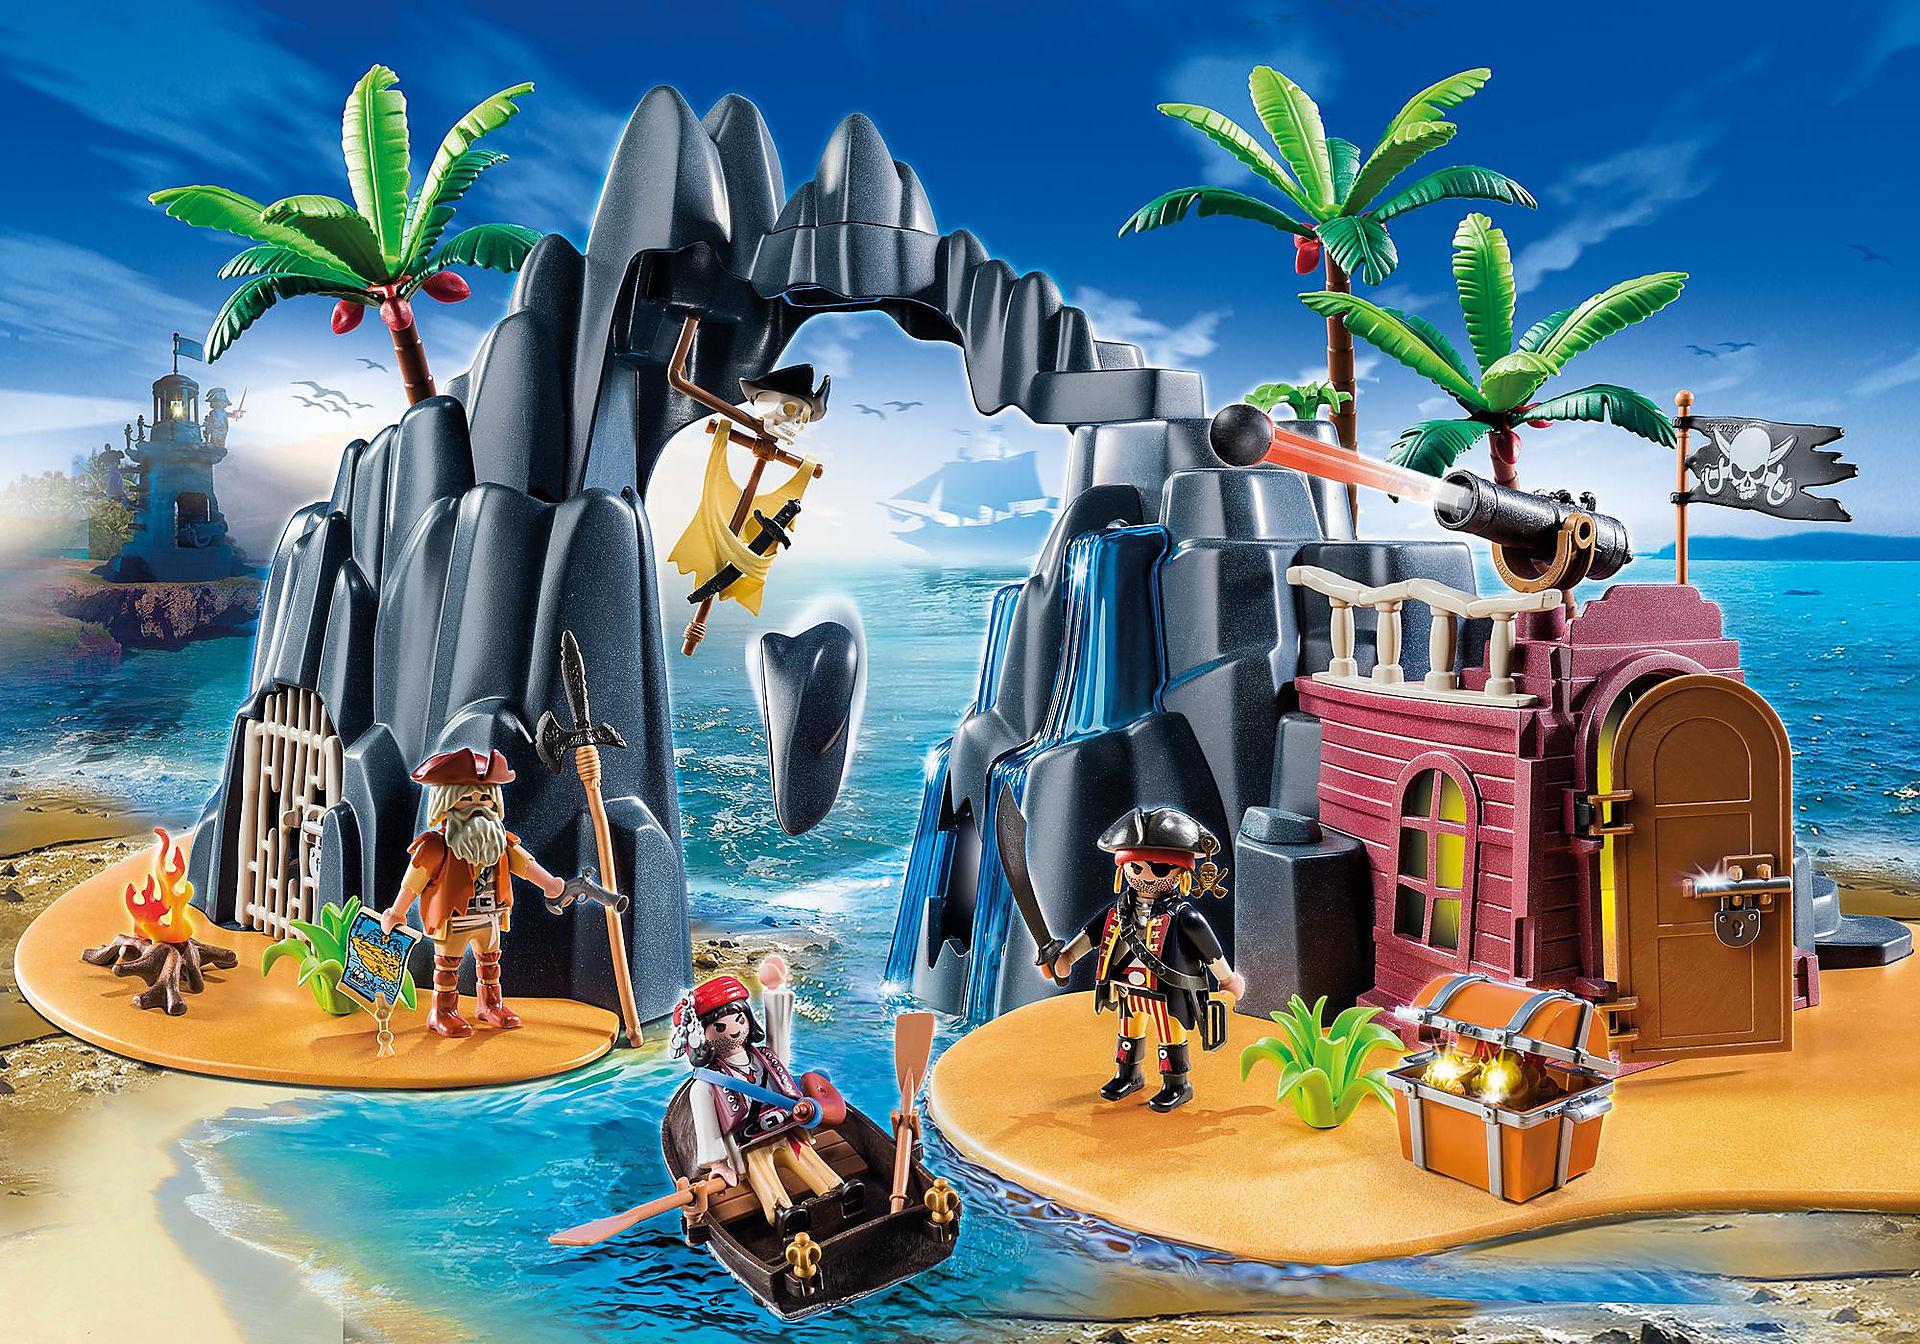 http://media.playmobil.com/i/playmobil/6679_product_detail/Pirate Treasure Island